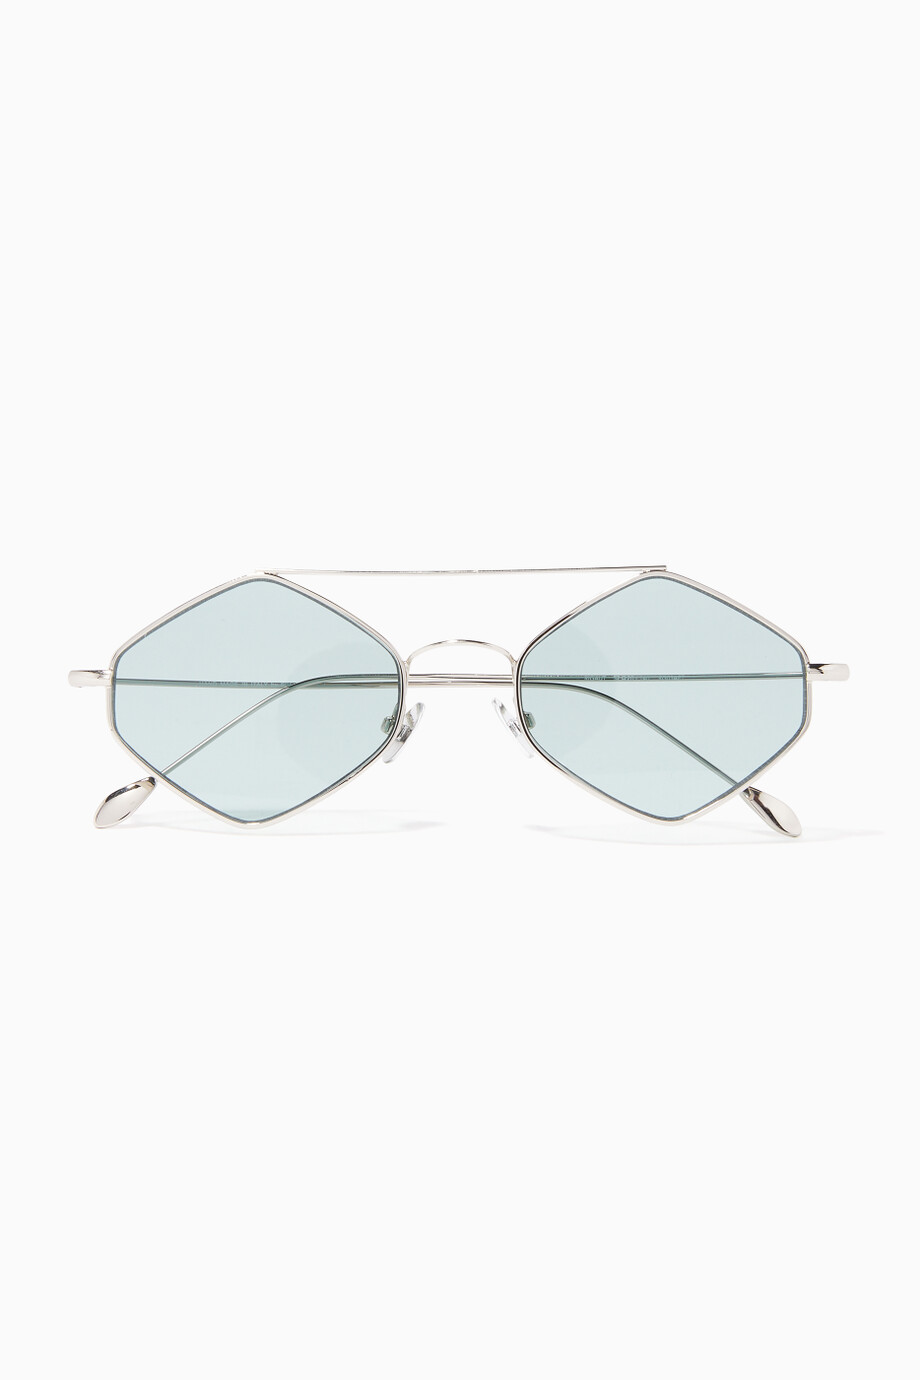 6328328c3 Shop Spektre Green Rigaut Geometric Frame Sunglasses for Men ...